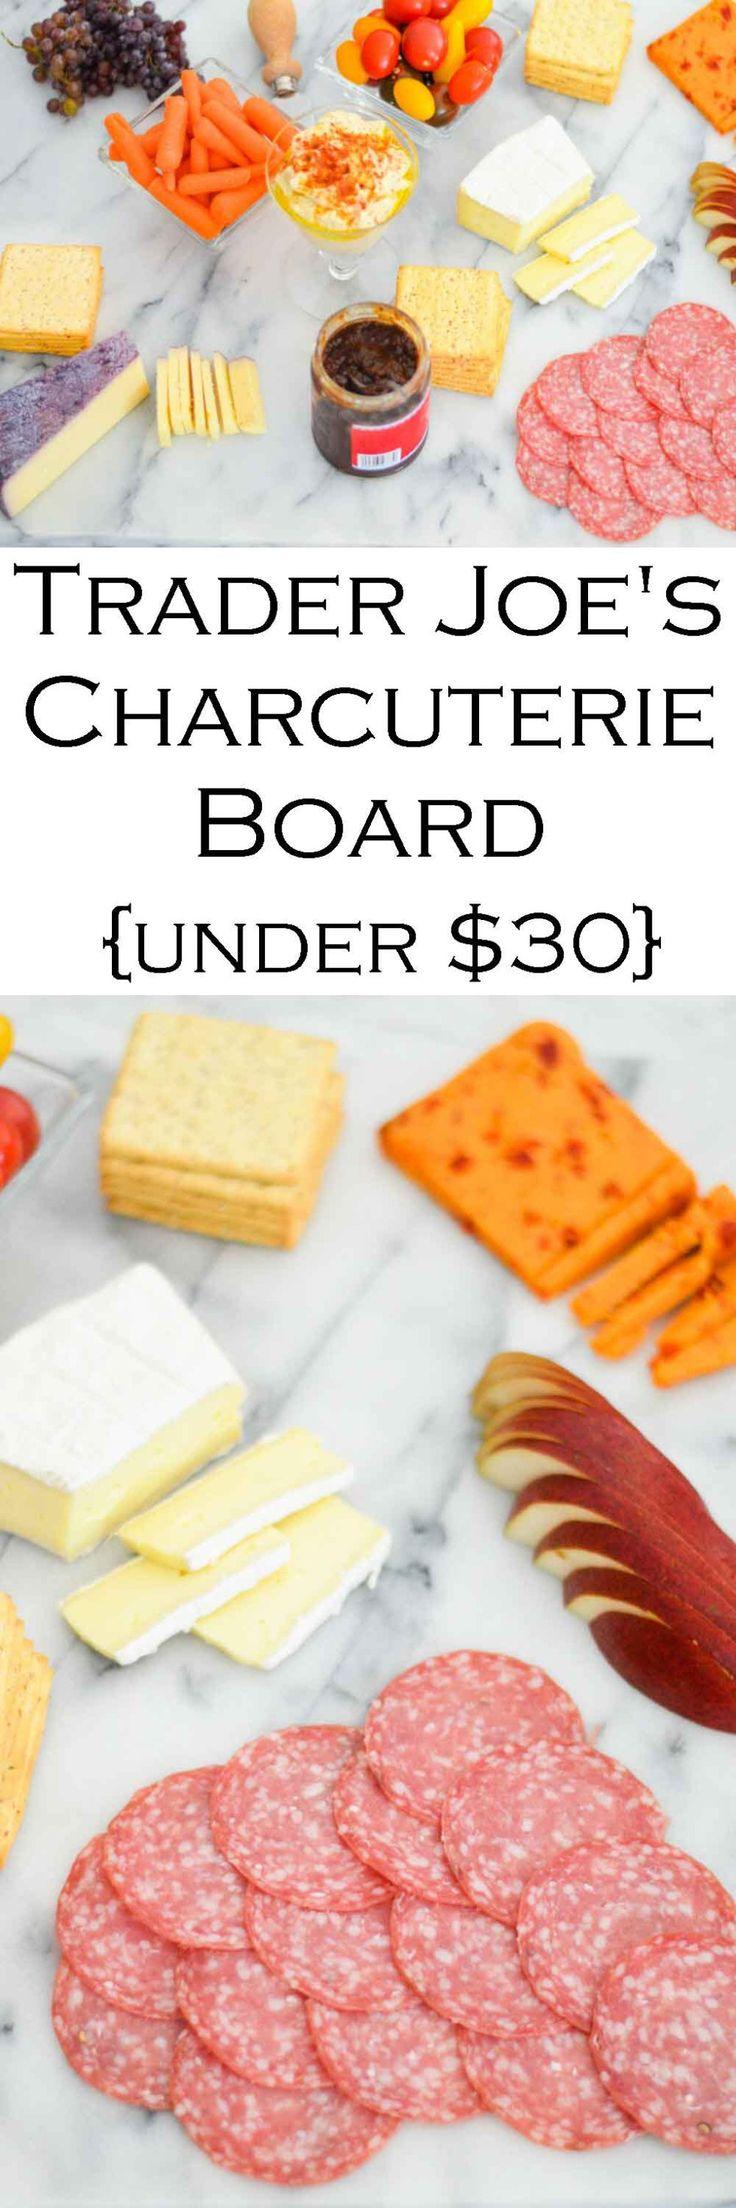 Cheap + Easy Charcuterie Plate - Trader Joe's Charcuterie Board #charcuterie #meatplate #cheeseplate #traderjoes #appetizer #lmrecipes #meatplate #cheeseplate